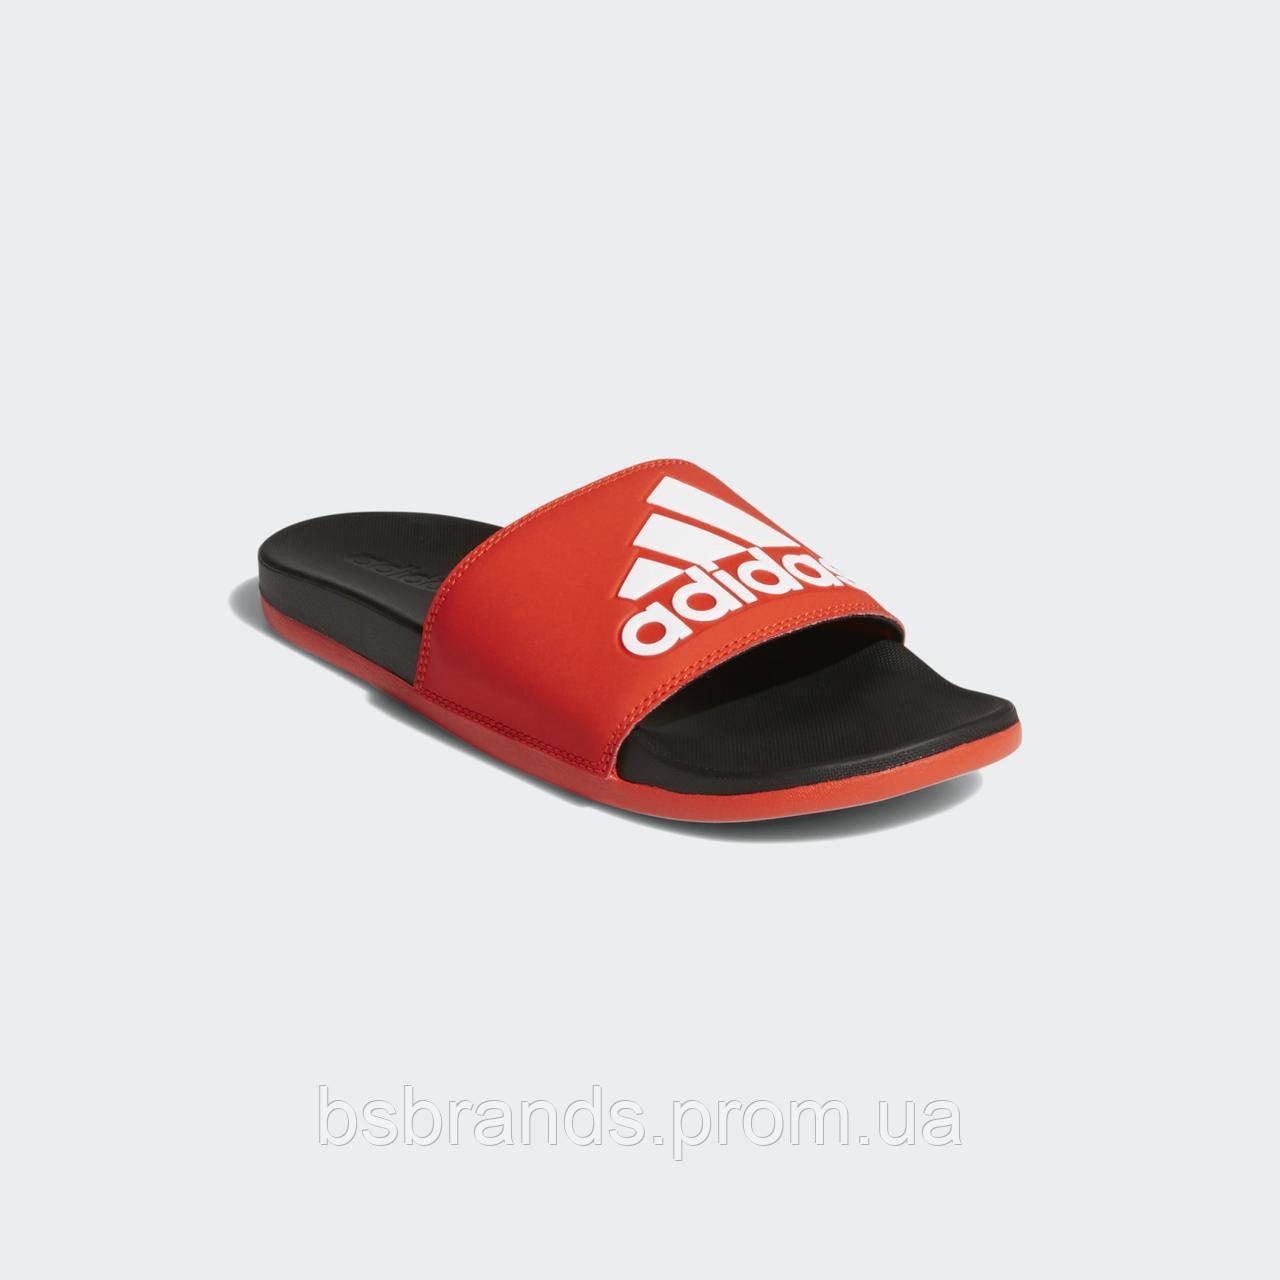 Мужские шлепанцы adidas Adilette Cloudfoam Plus Logo F34722 (2020/1)